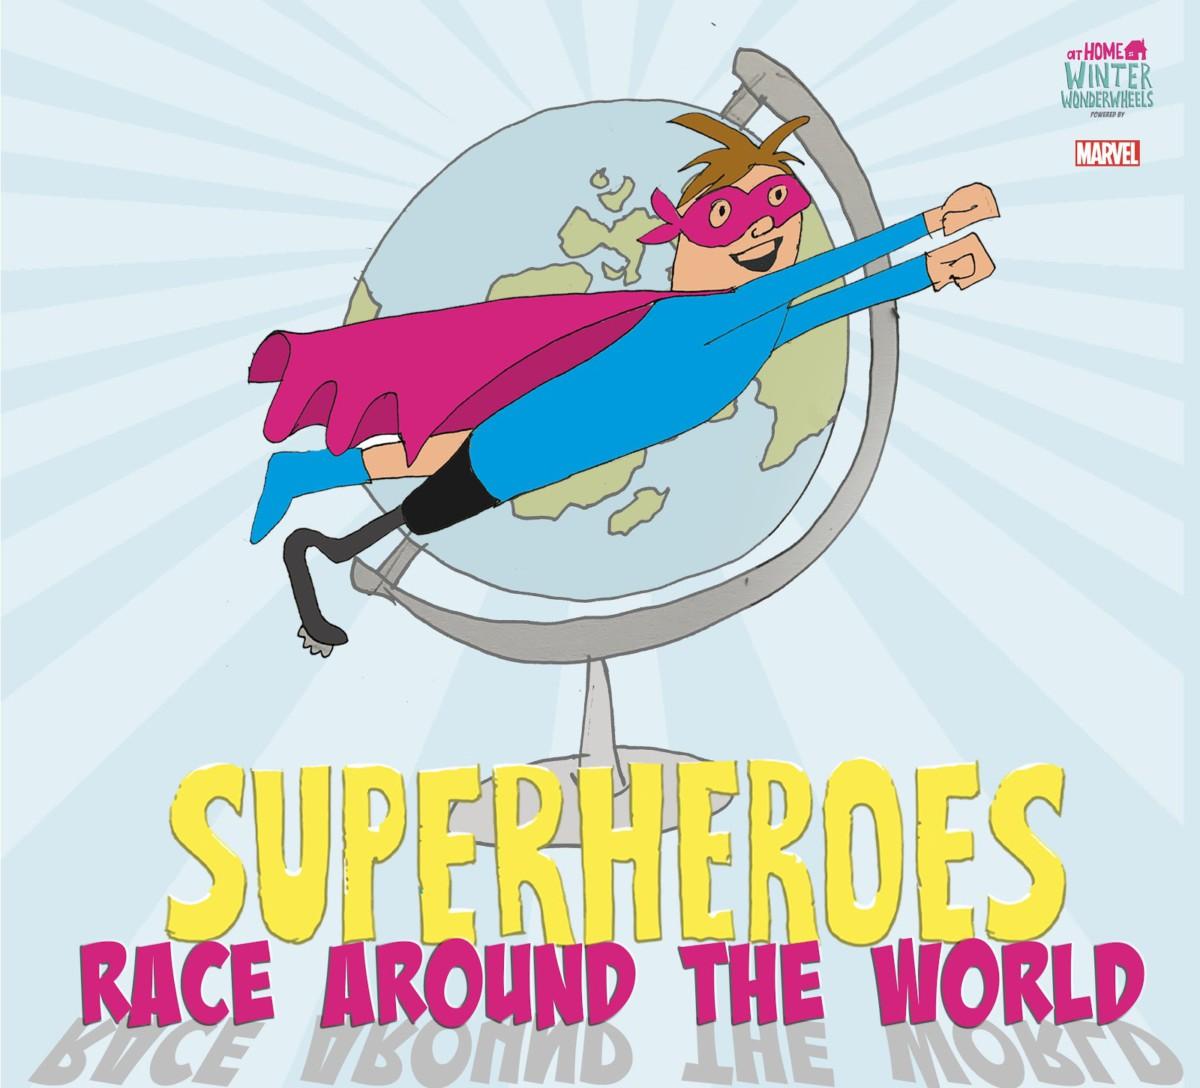 The Superhero Series - Superheroes Race Around The World